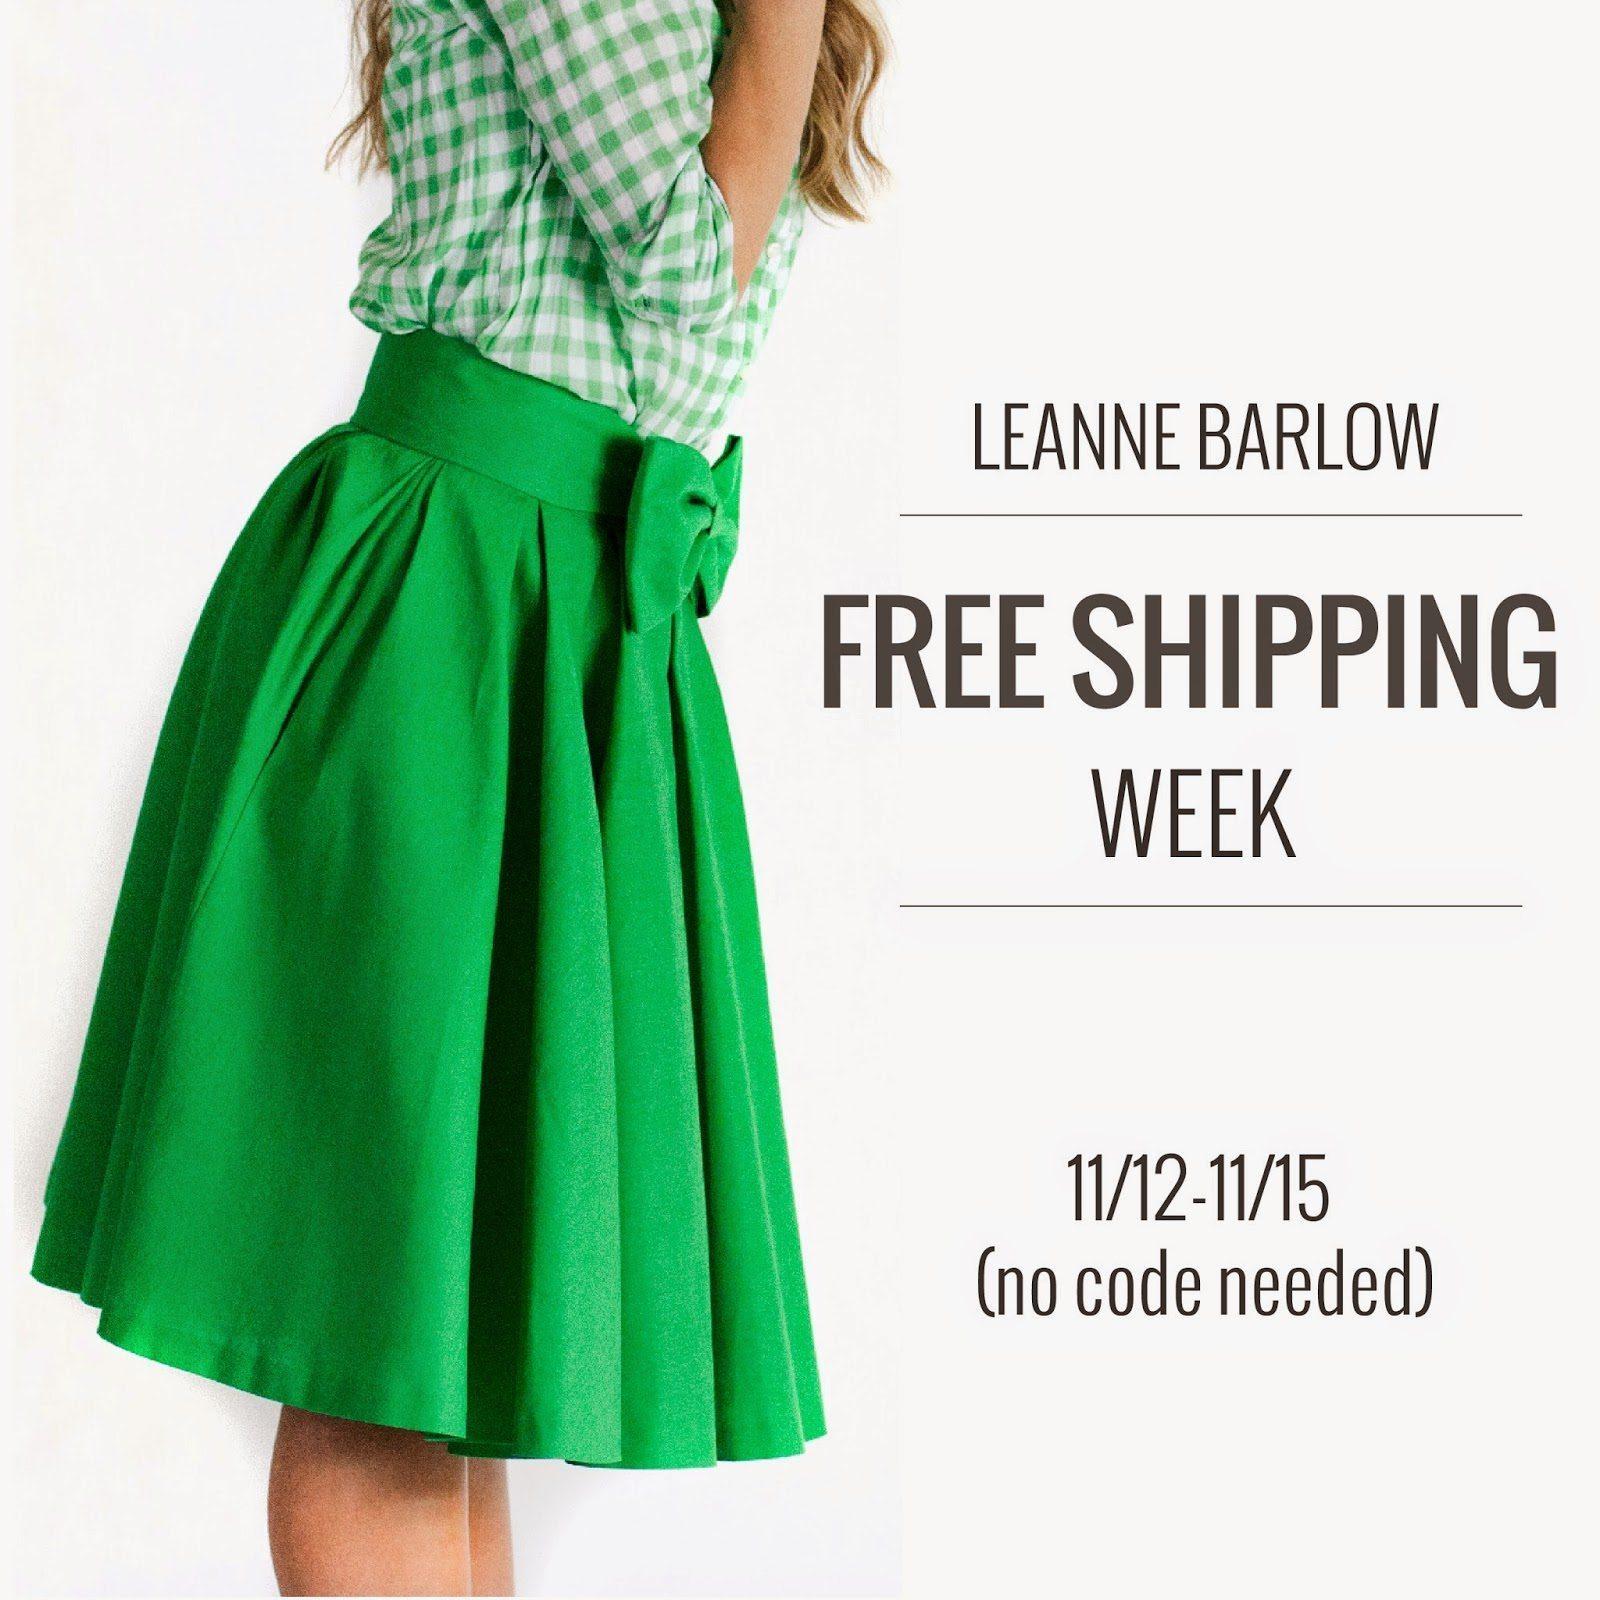 LEANNEBARLOW.COM FREE SHIPPING WEEK!